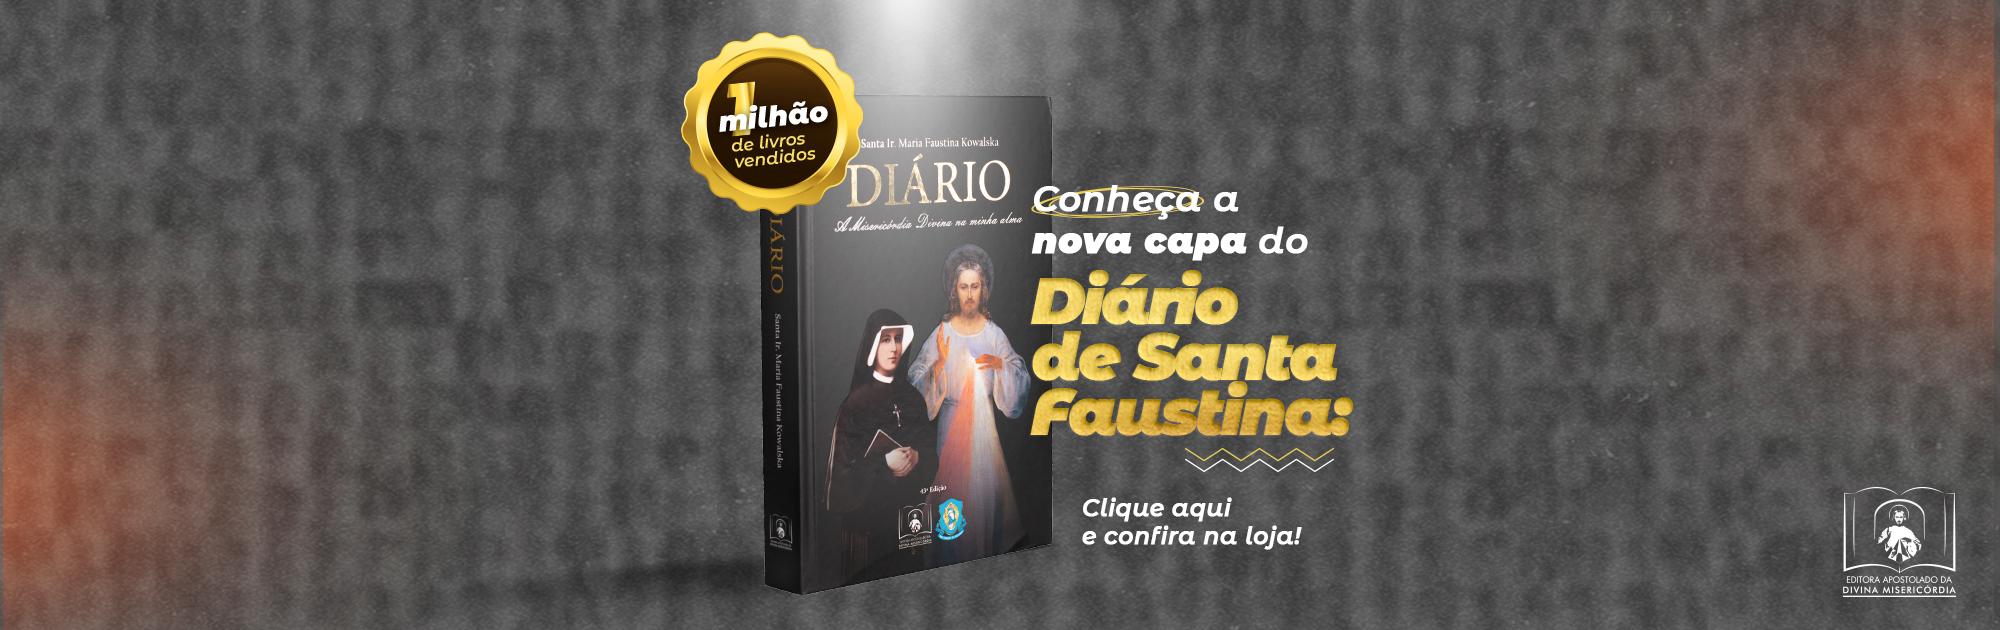 Banner-Blog----Santuário-da-Divina-Misericórdia